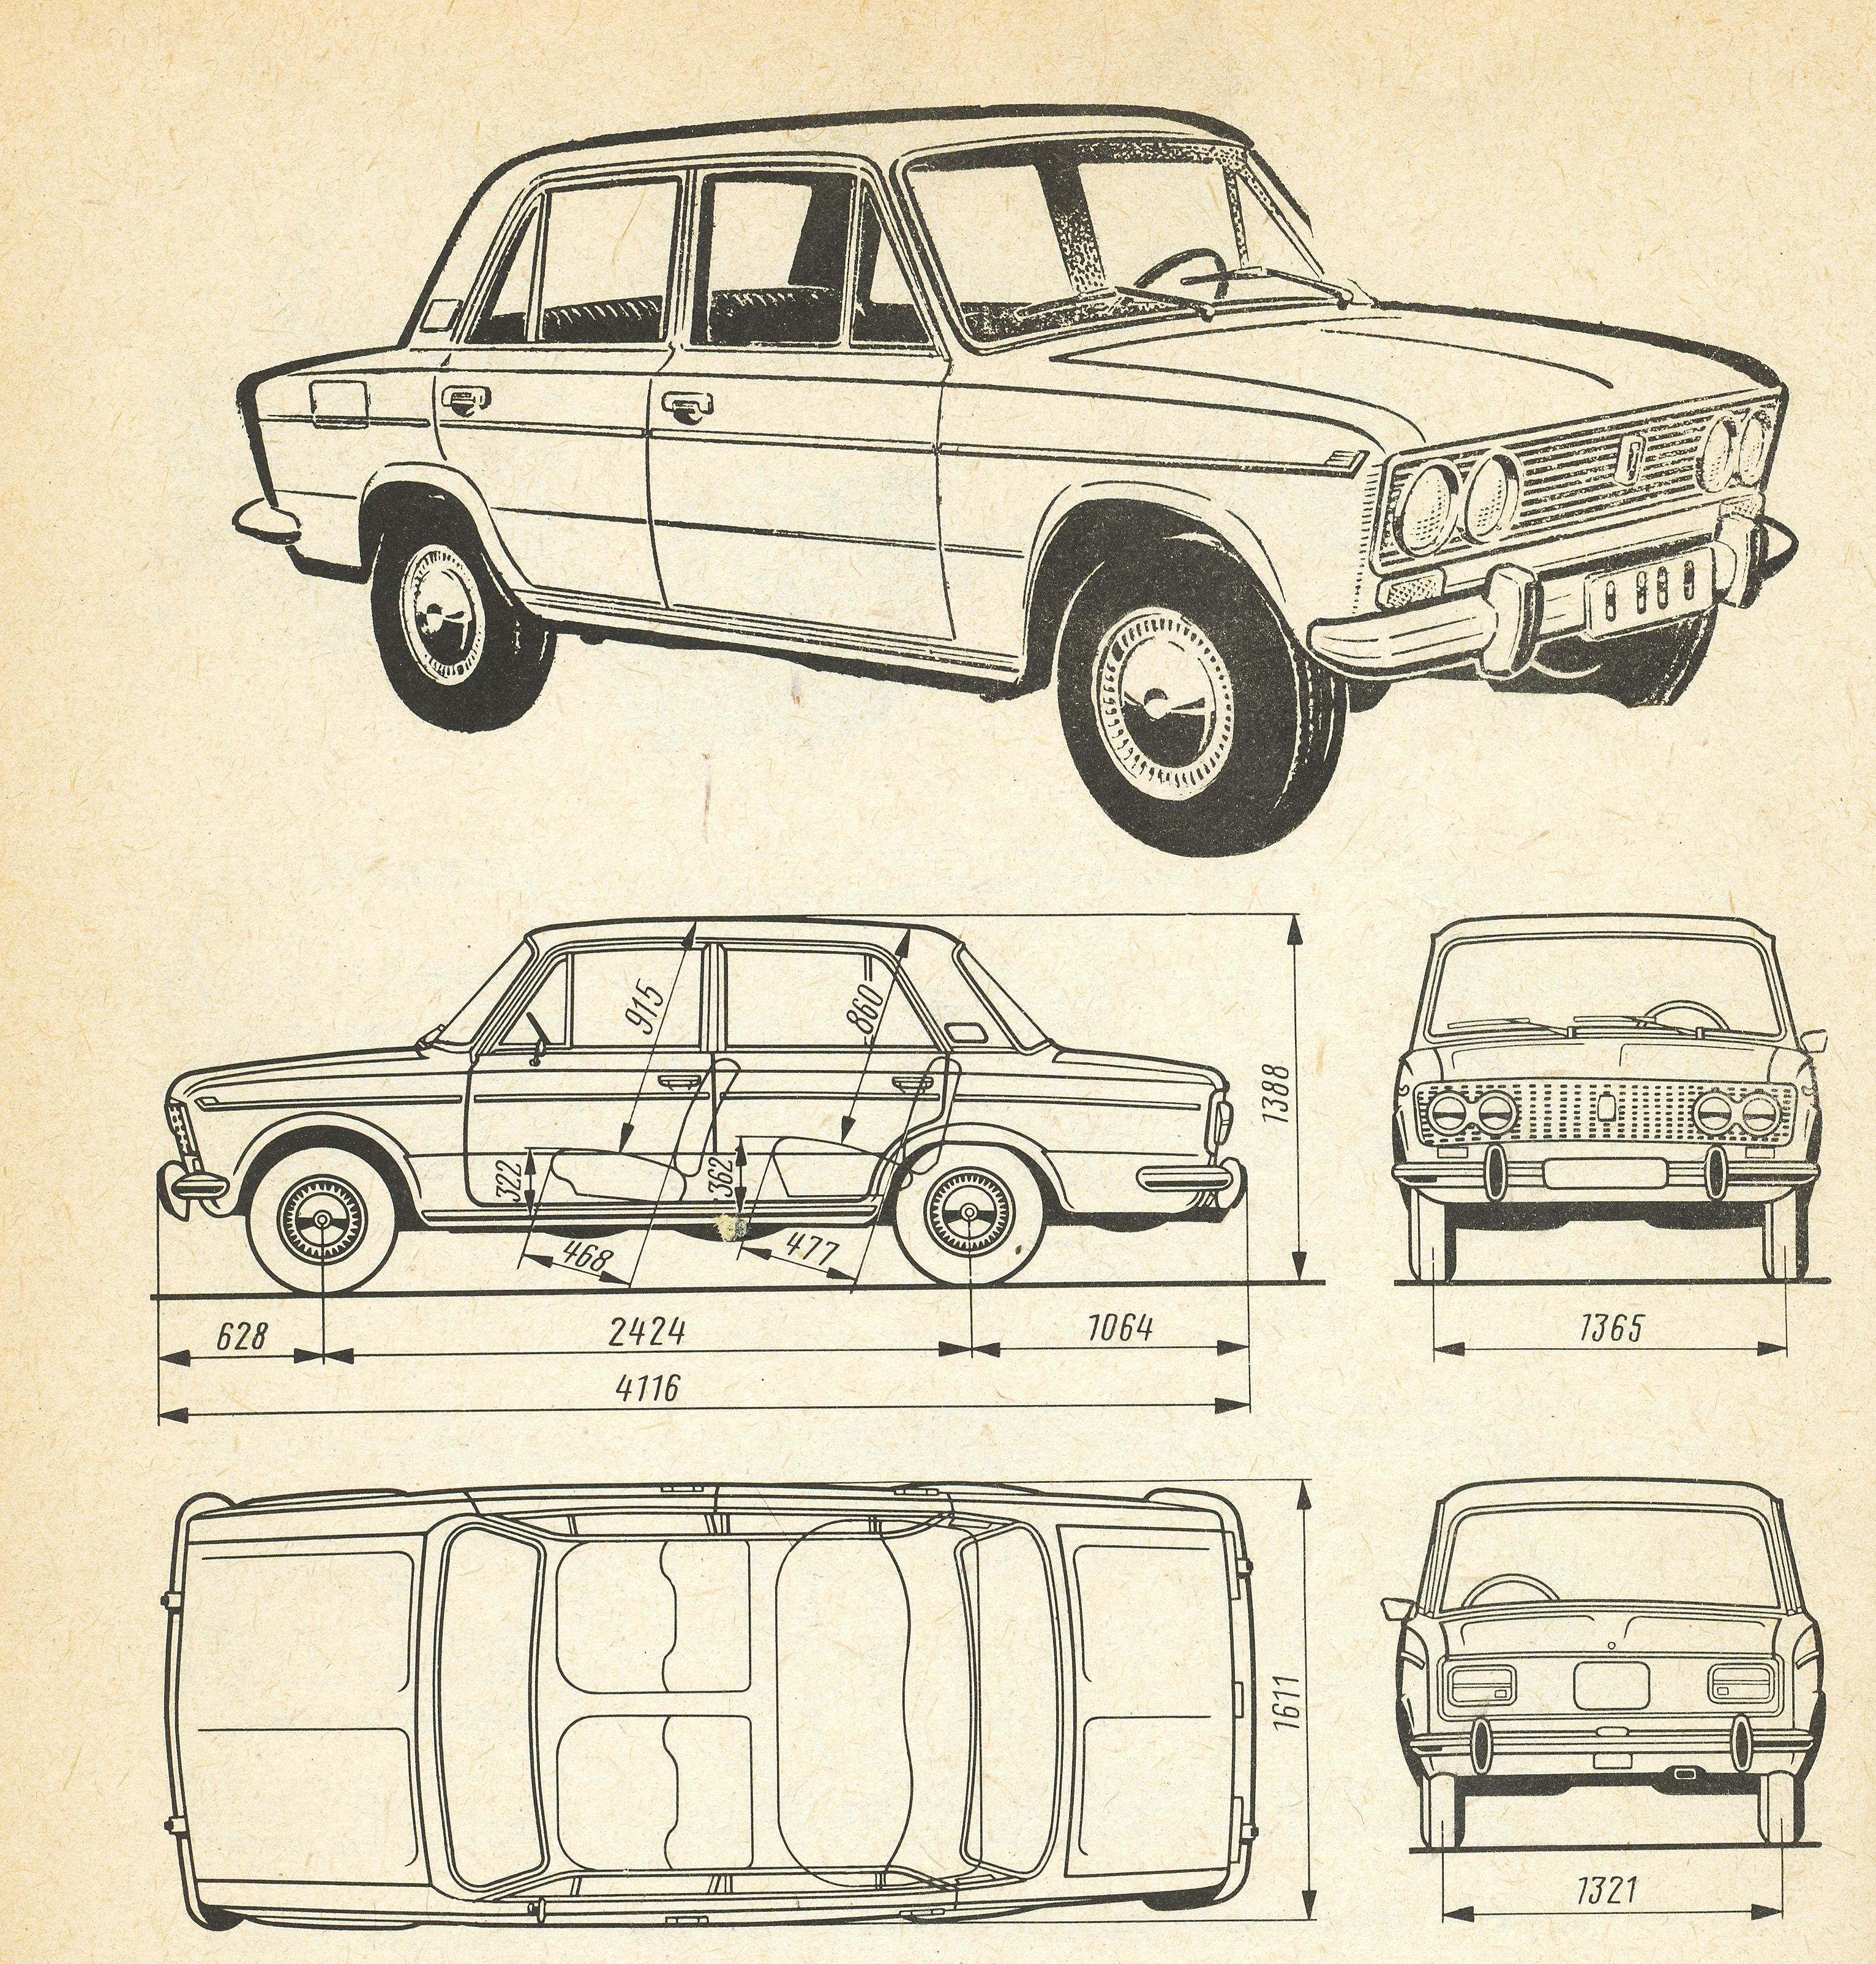 old car blueprint. blueprint auto antiguo | Blueprints | Pinterest ...